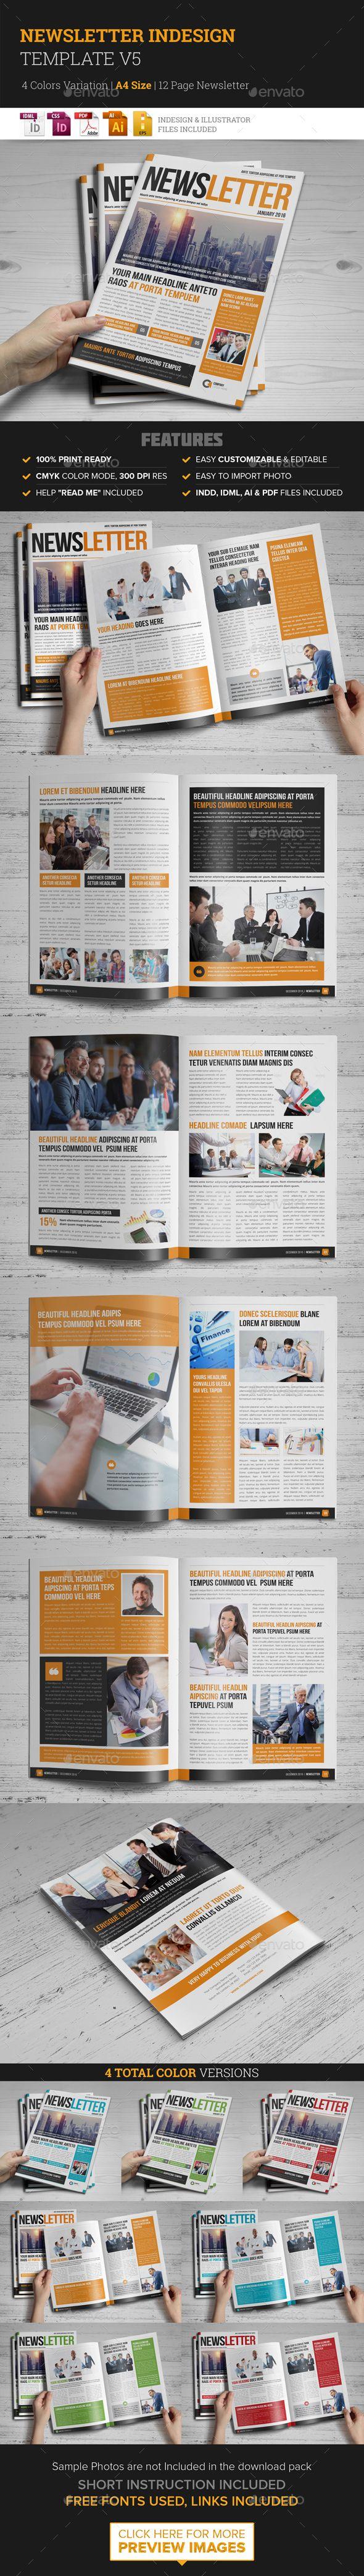 Newsletter Indesign Template v5 | Diseño editorial, Editorial y Revistas